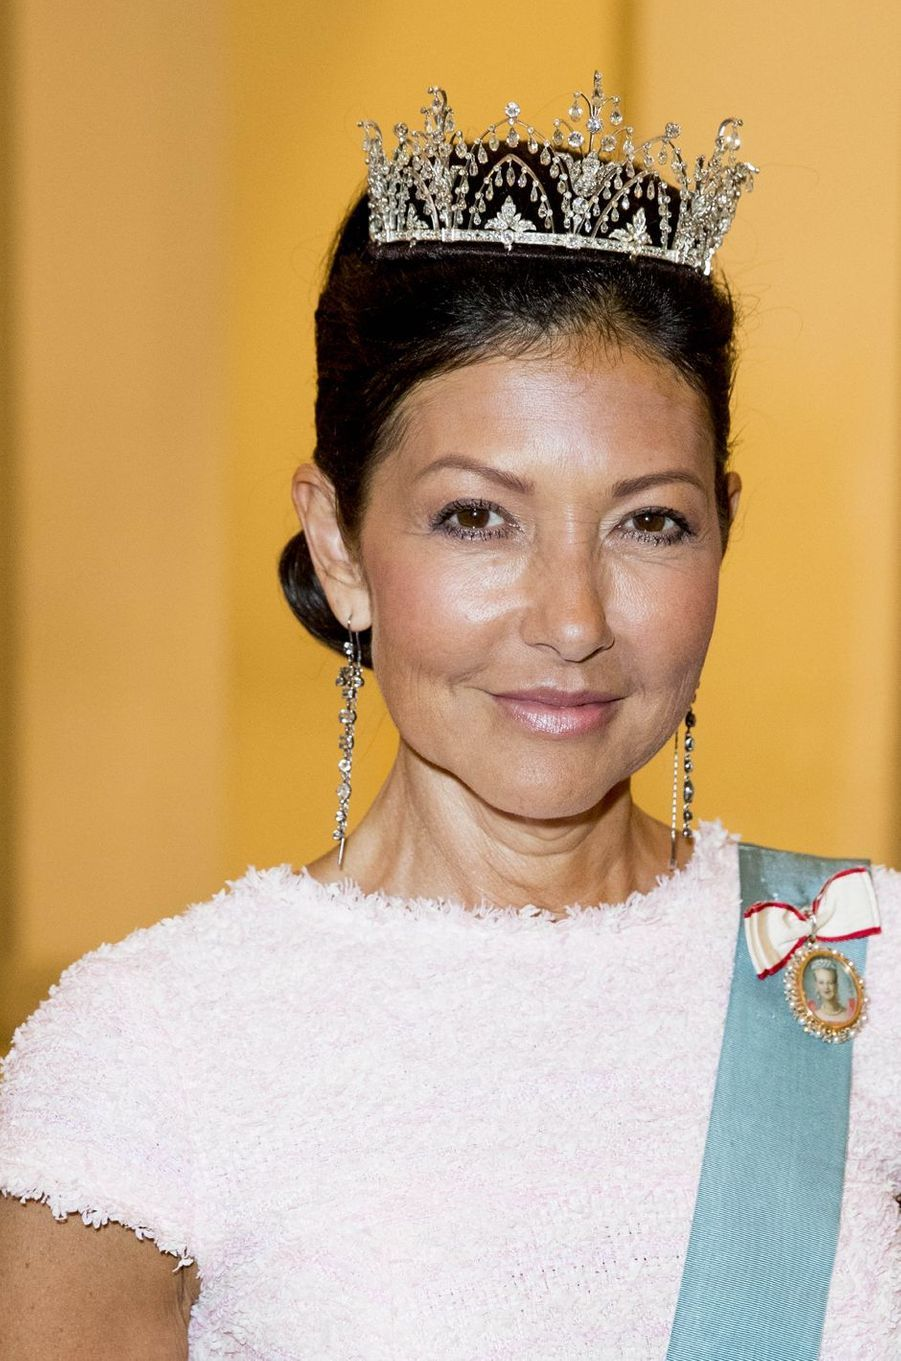 La comtesse Alexandra de Frederiksborg à Copenhague, le 26 mai 2018